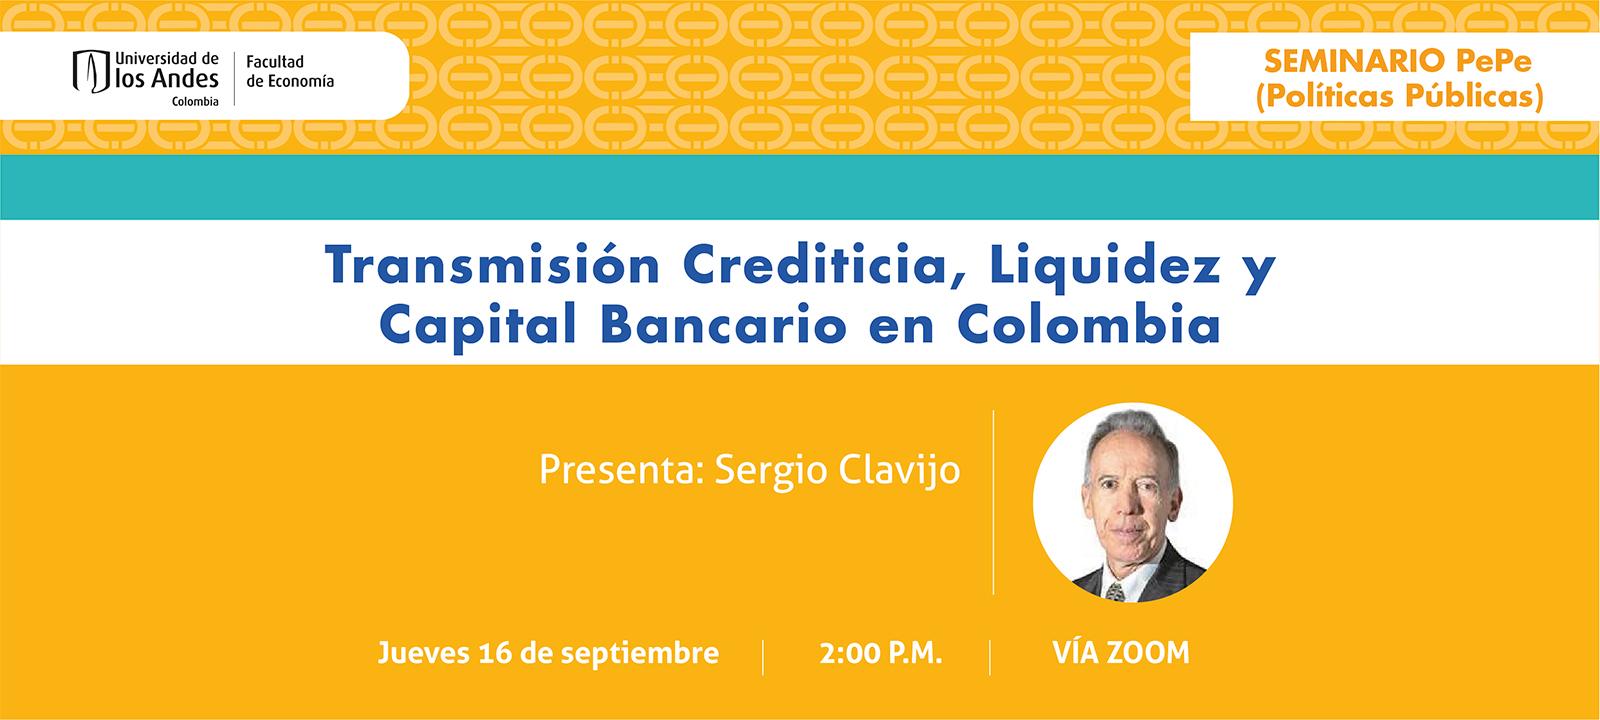 SeminarioPepe-2021-09-16-Sergio-Clavijo.jpg